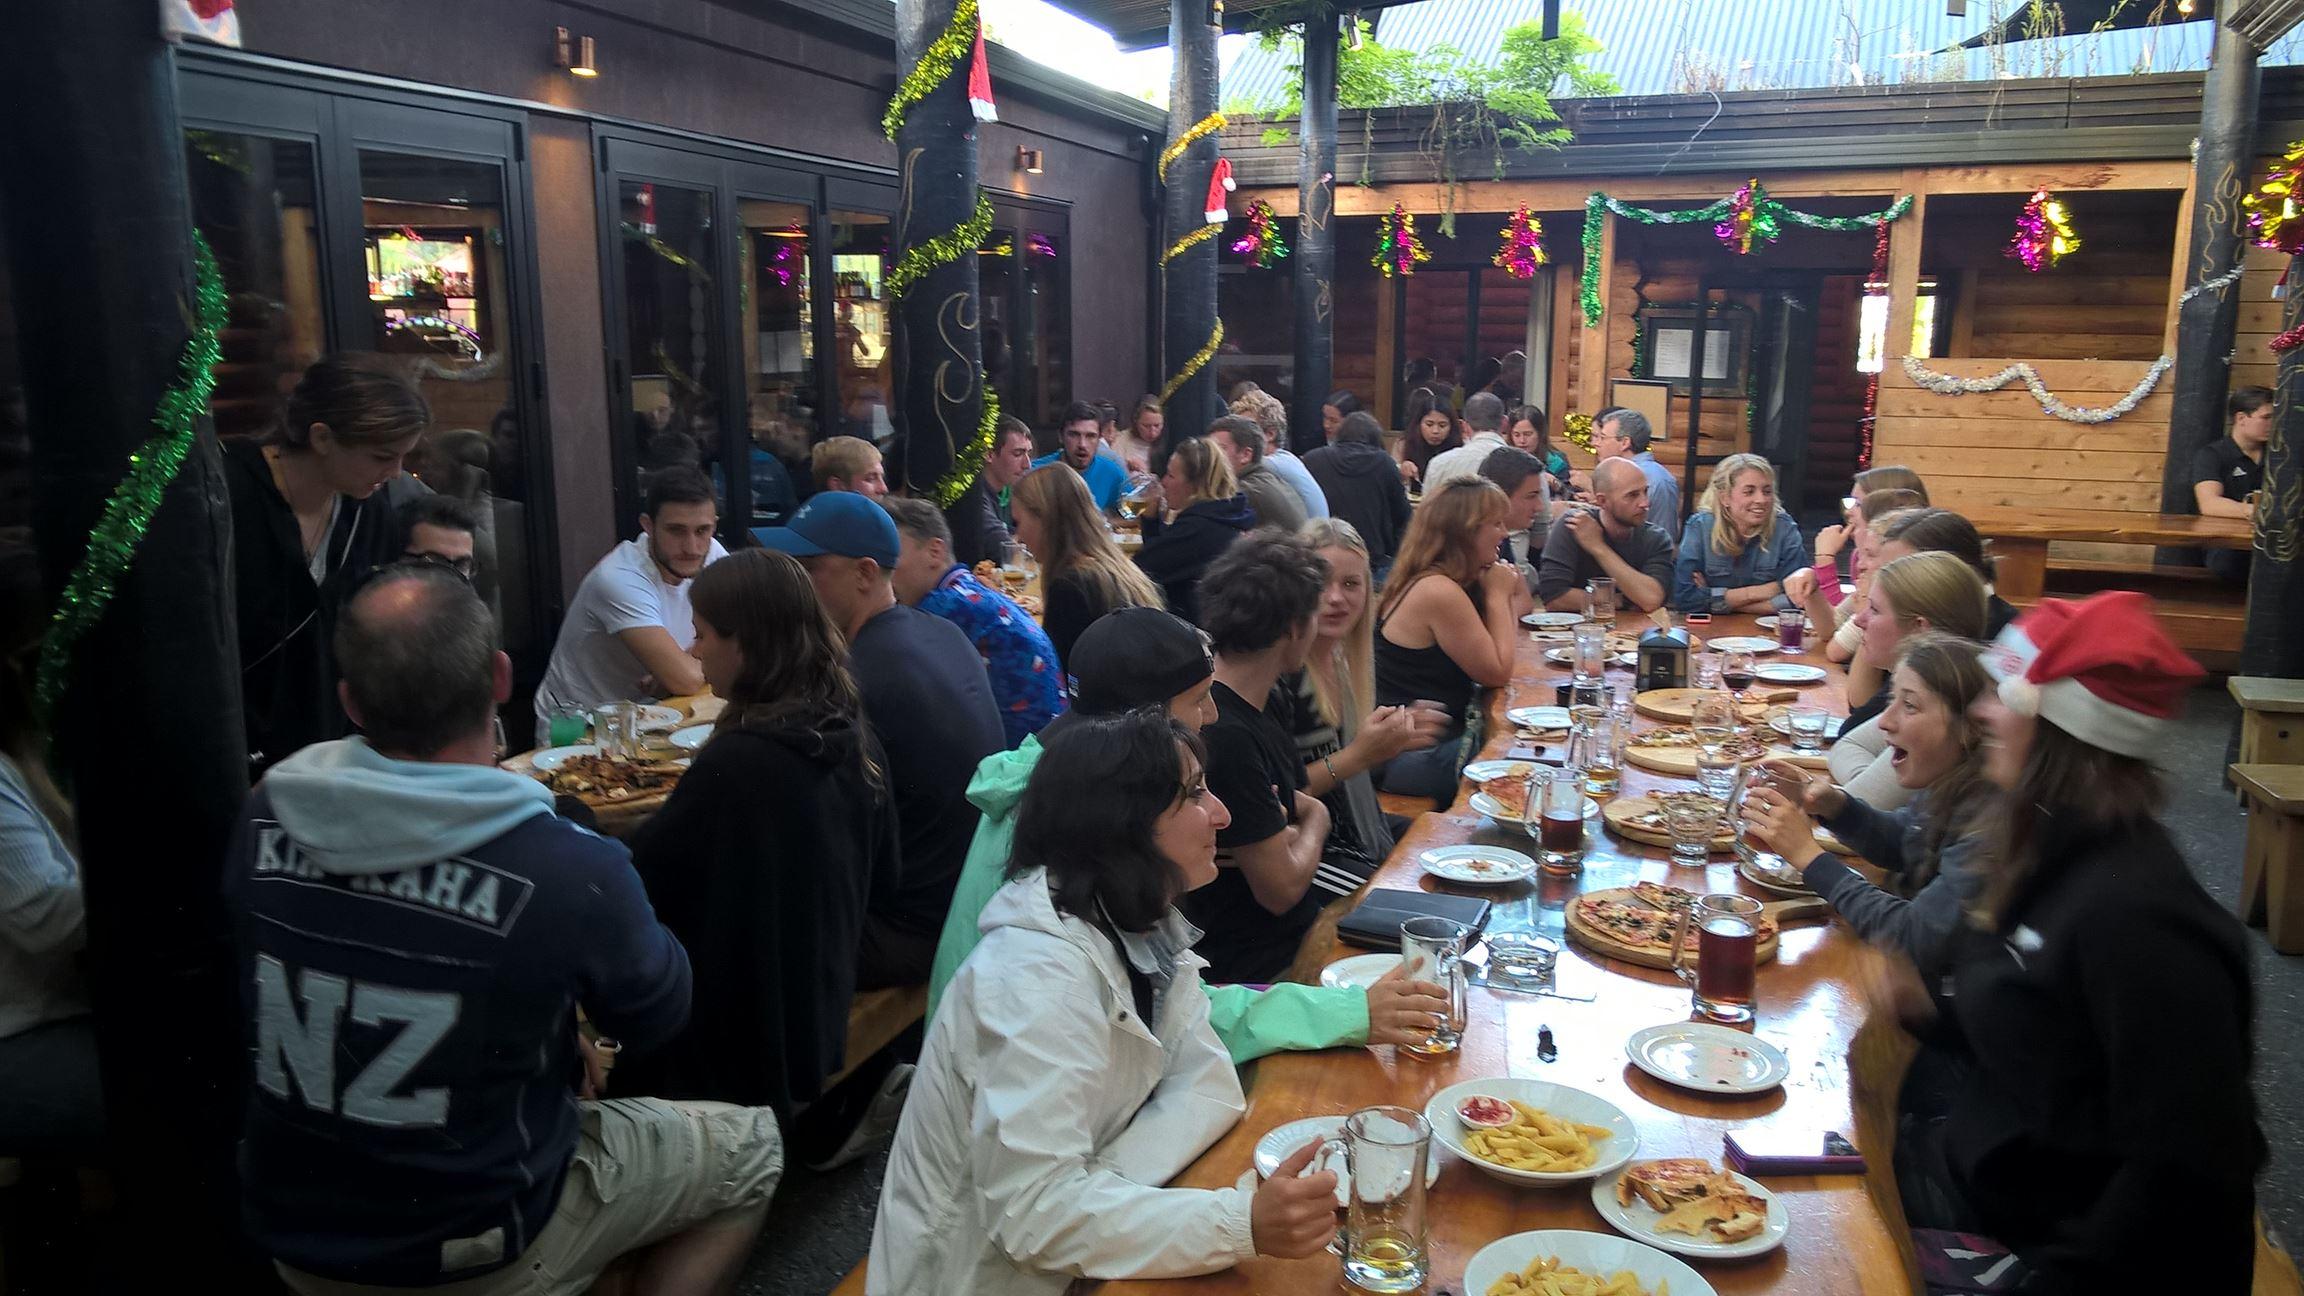 Pizzafest in Franz Joseph